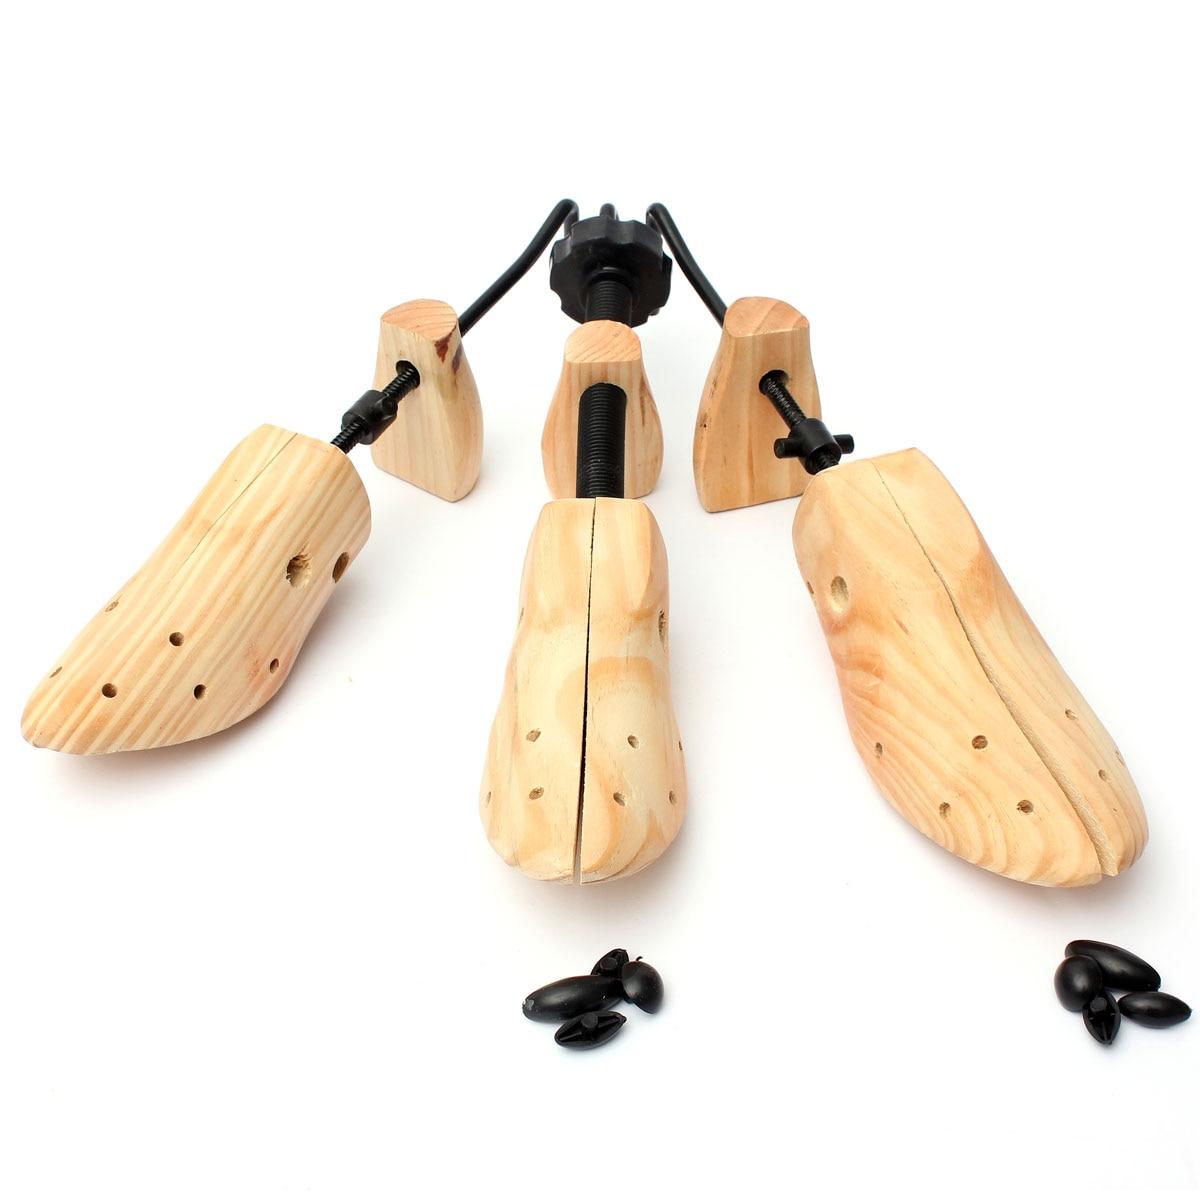 1Pcs Durable Shoe Tree Wood Shoes Stretcher, Wooden Adjustable Man Women Flats Pumps Boot Shaper Rac